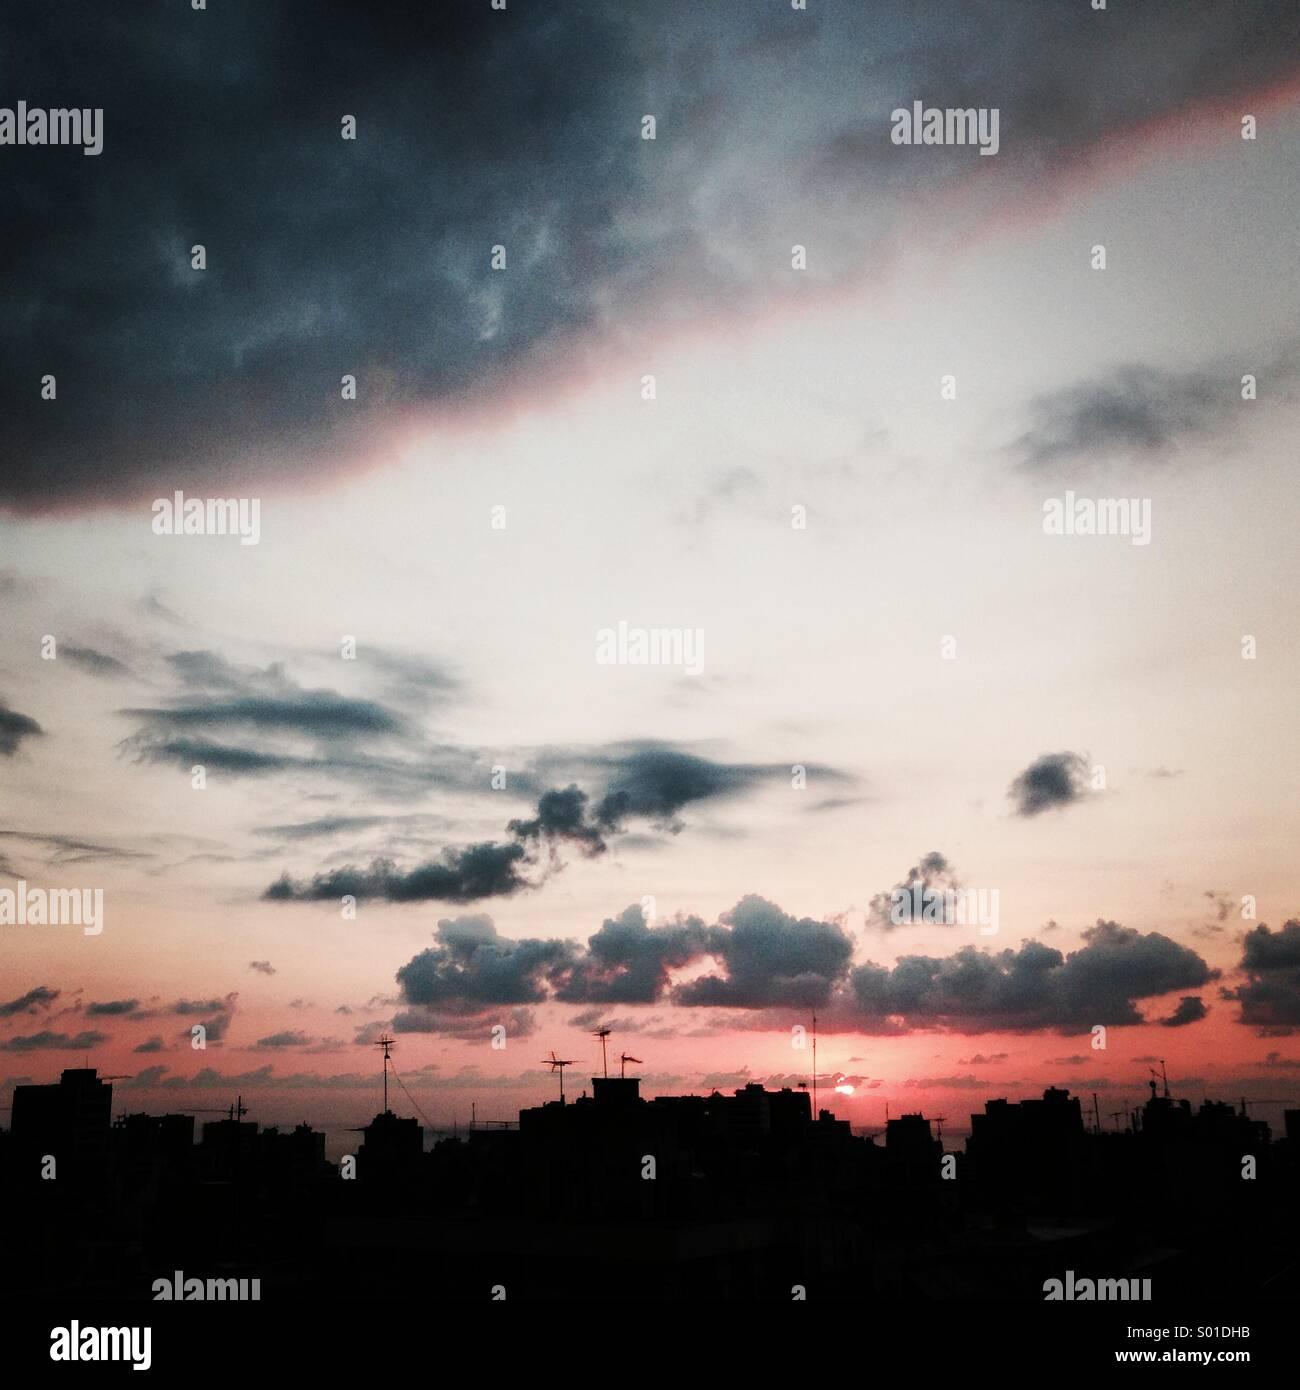 Cityscape coucher du soleil - Beyrouth Liban - Moyen-Orient Photo Stock